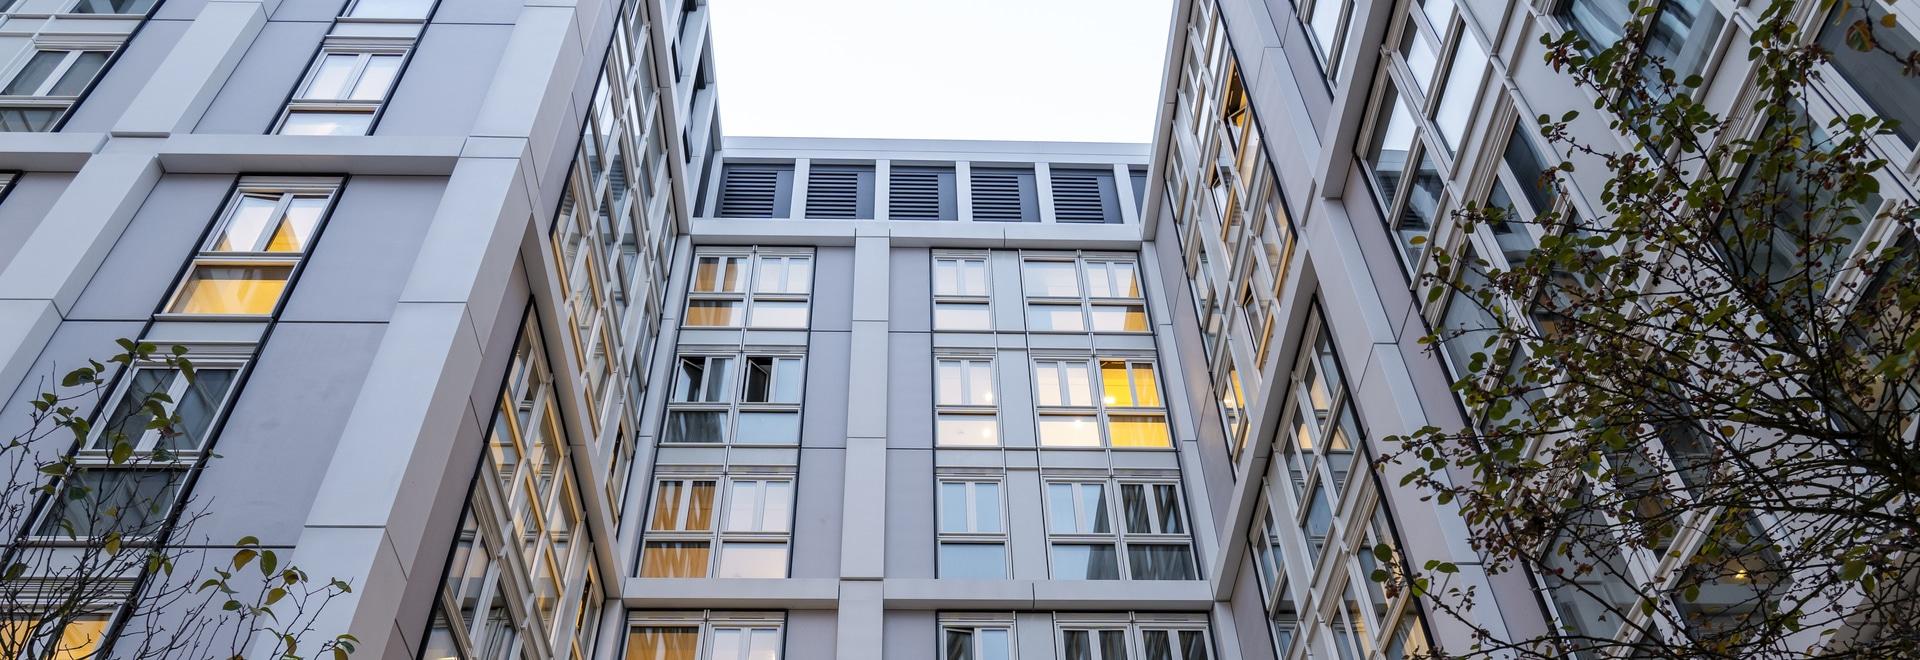 LEMA UK ist Partner des exklusiven neuen Wohnprojekts am Lincoln Square in London.